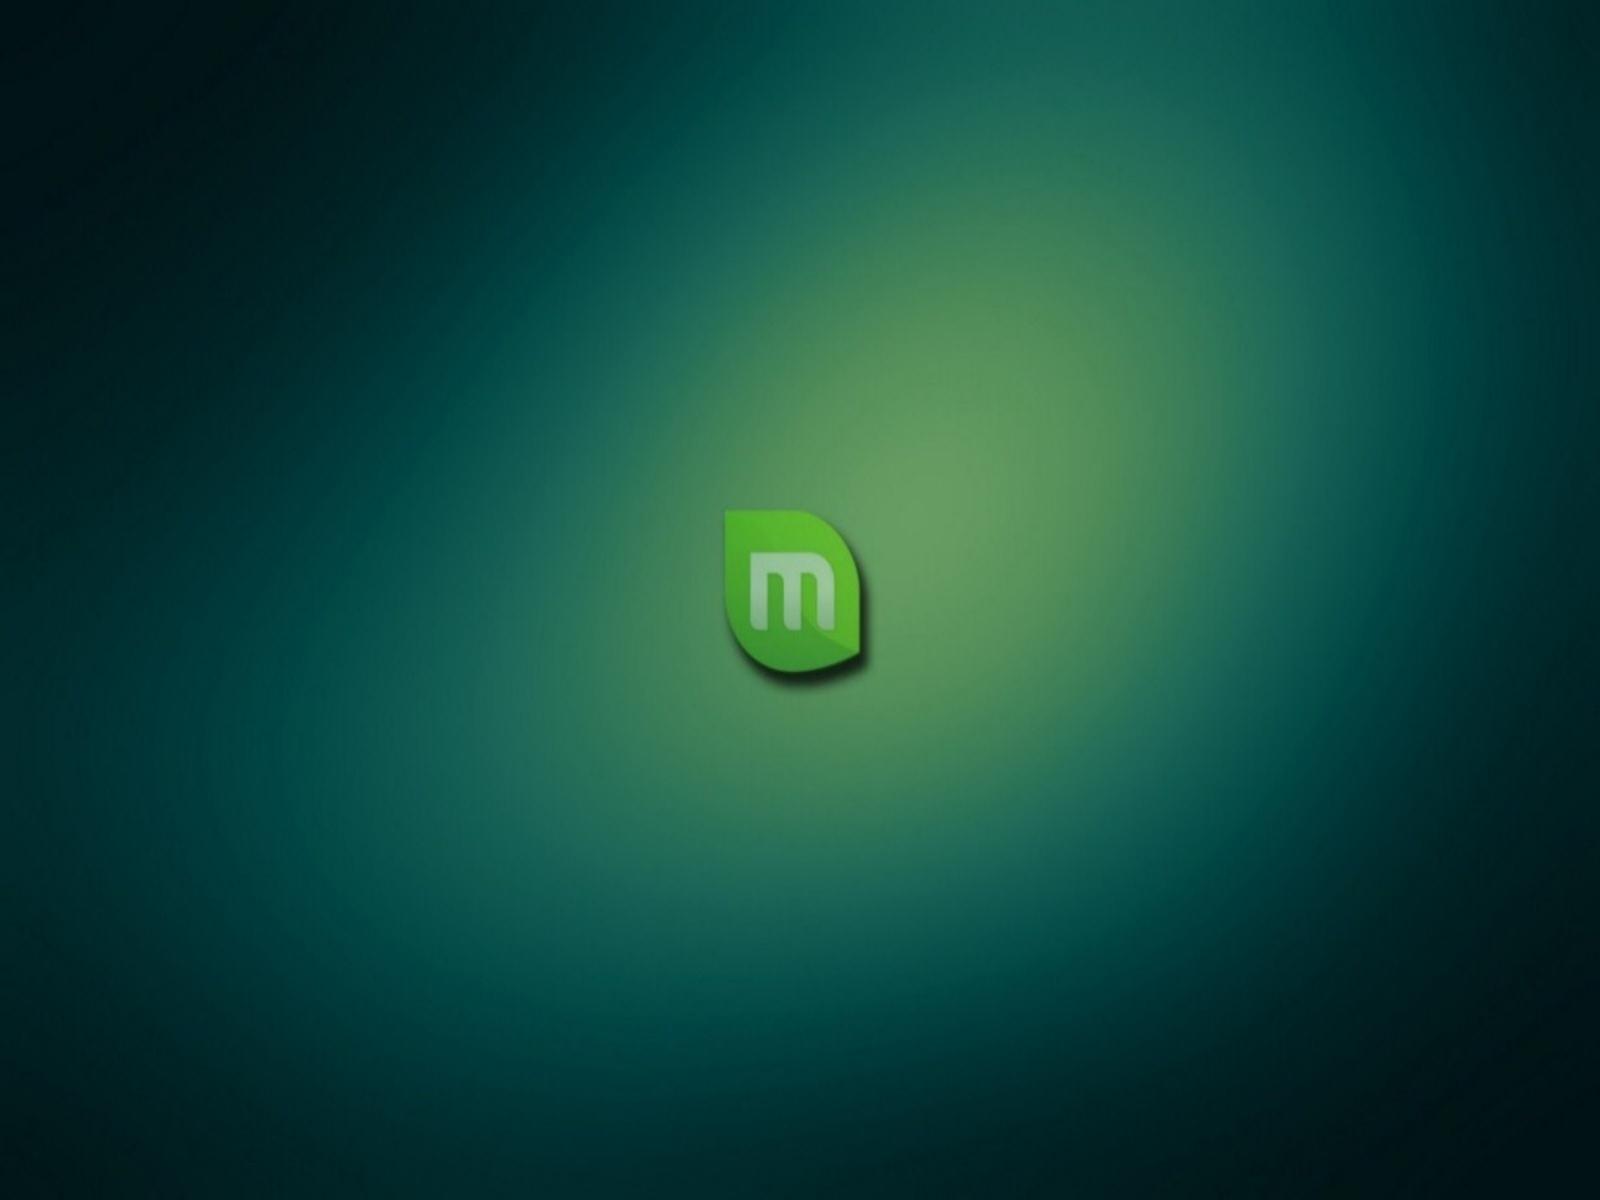 Mint Linux Top Wallpaper Desktop Background Revolutions Per Minute 1600x1200